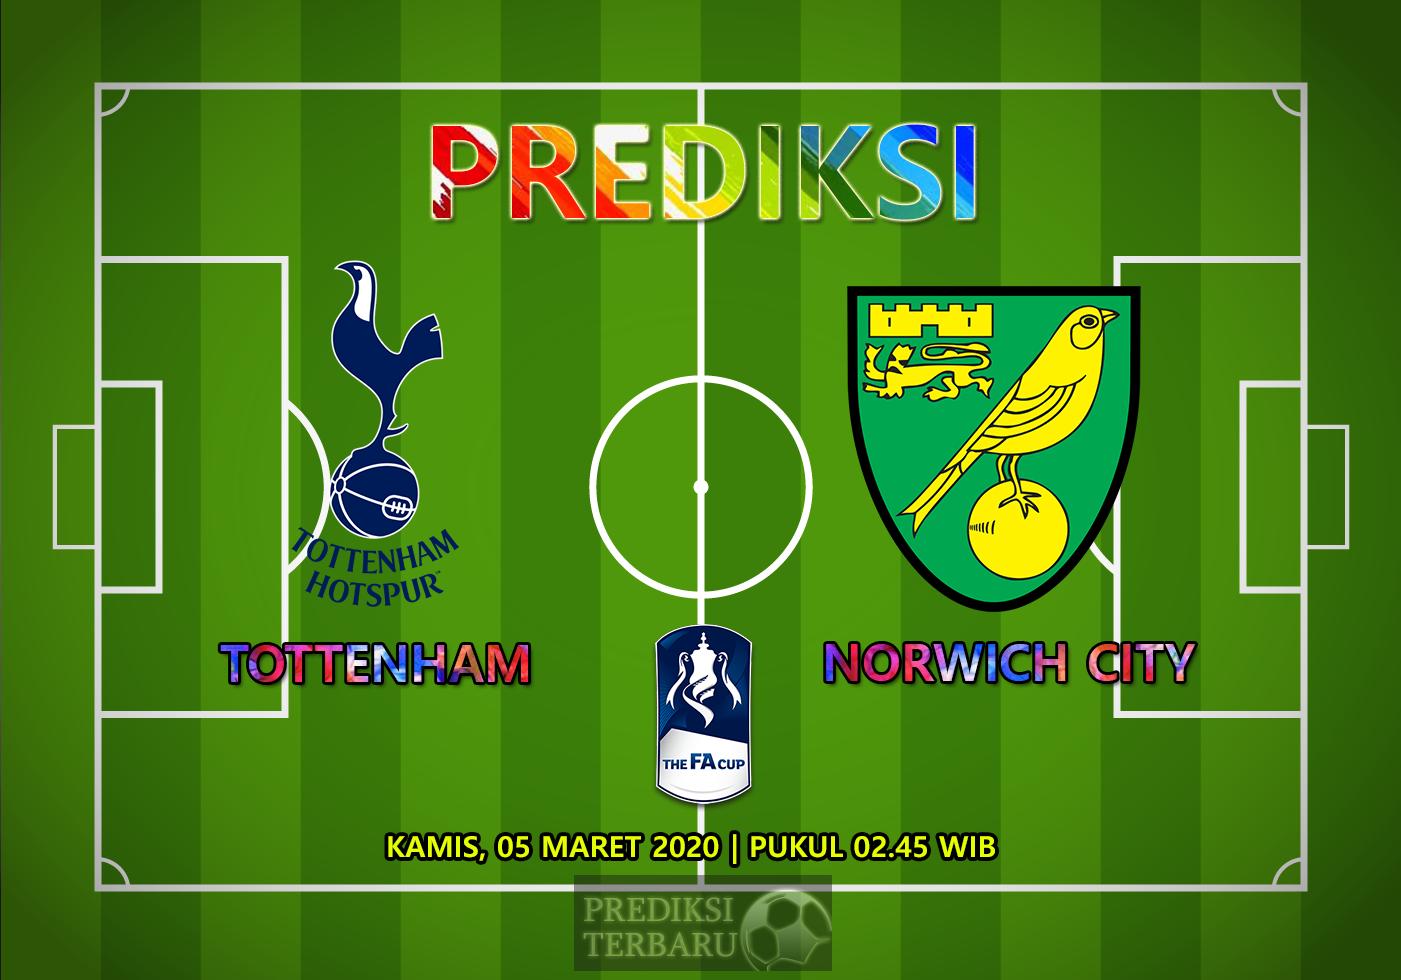 Prediksi Tottenham Hotspur Vs Norwich City Kamis 05 Maret